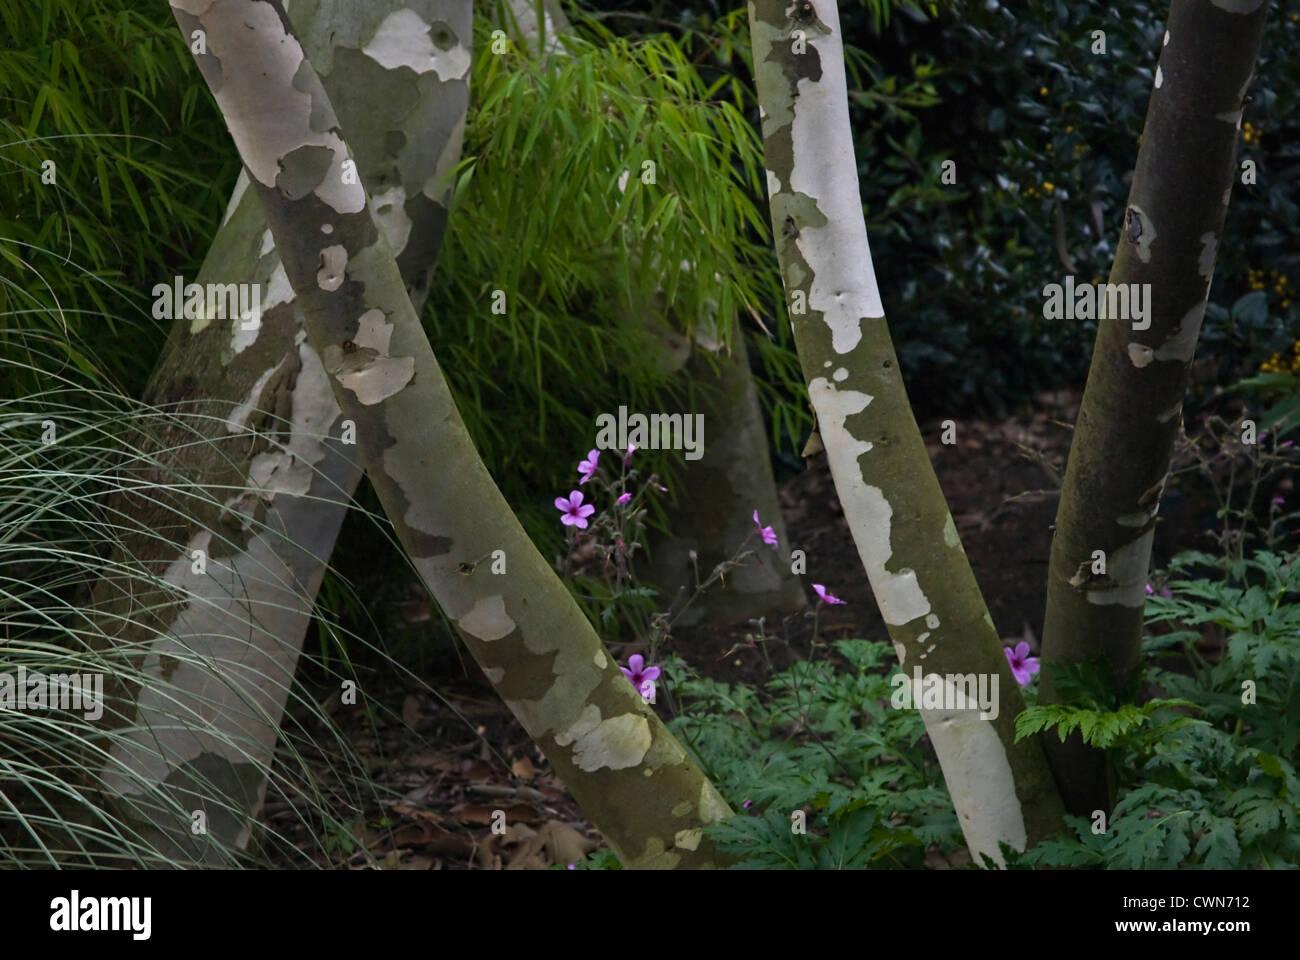 Eucalyptus niphophila, Snow gum - Stock Image